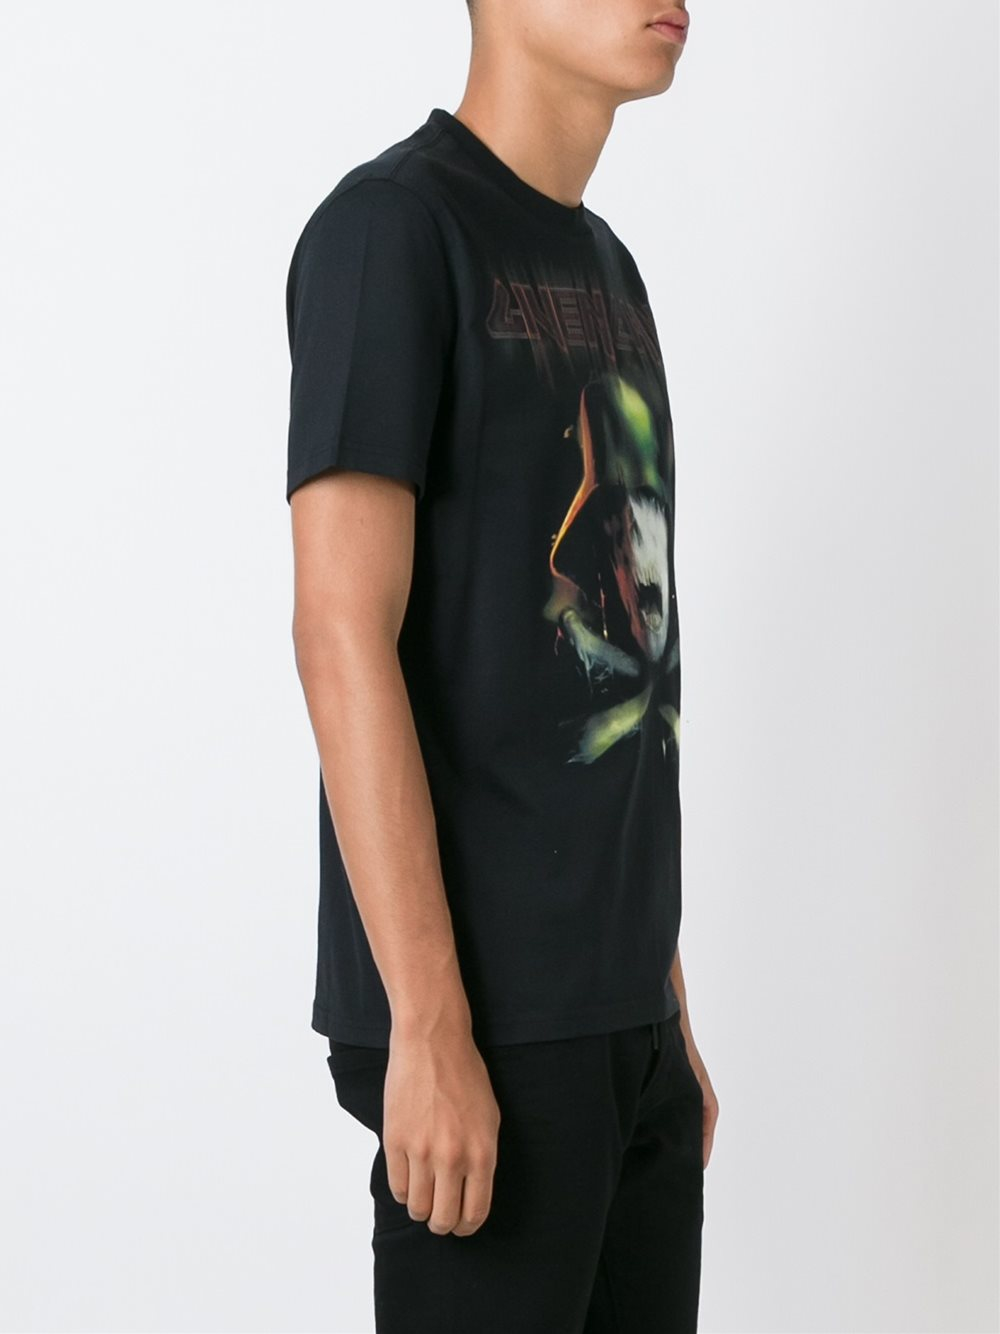 Givenchy logo print t shirt men cotton m in black for Givenchy t shirt man